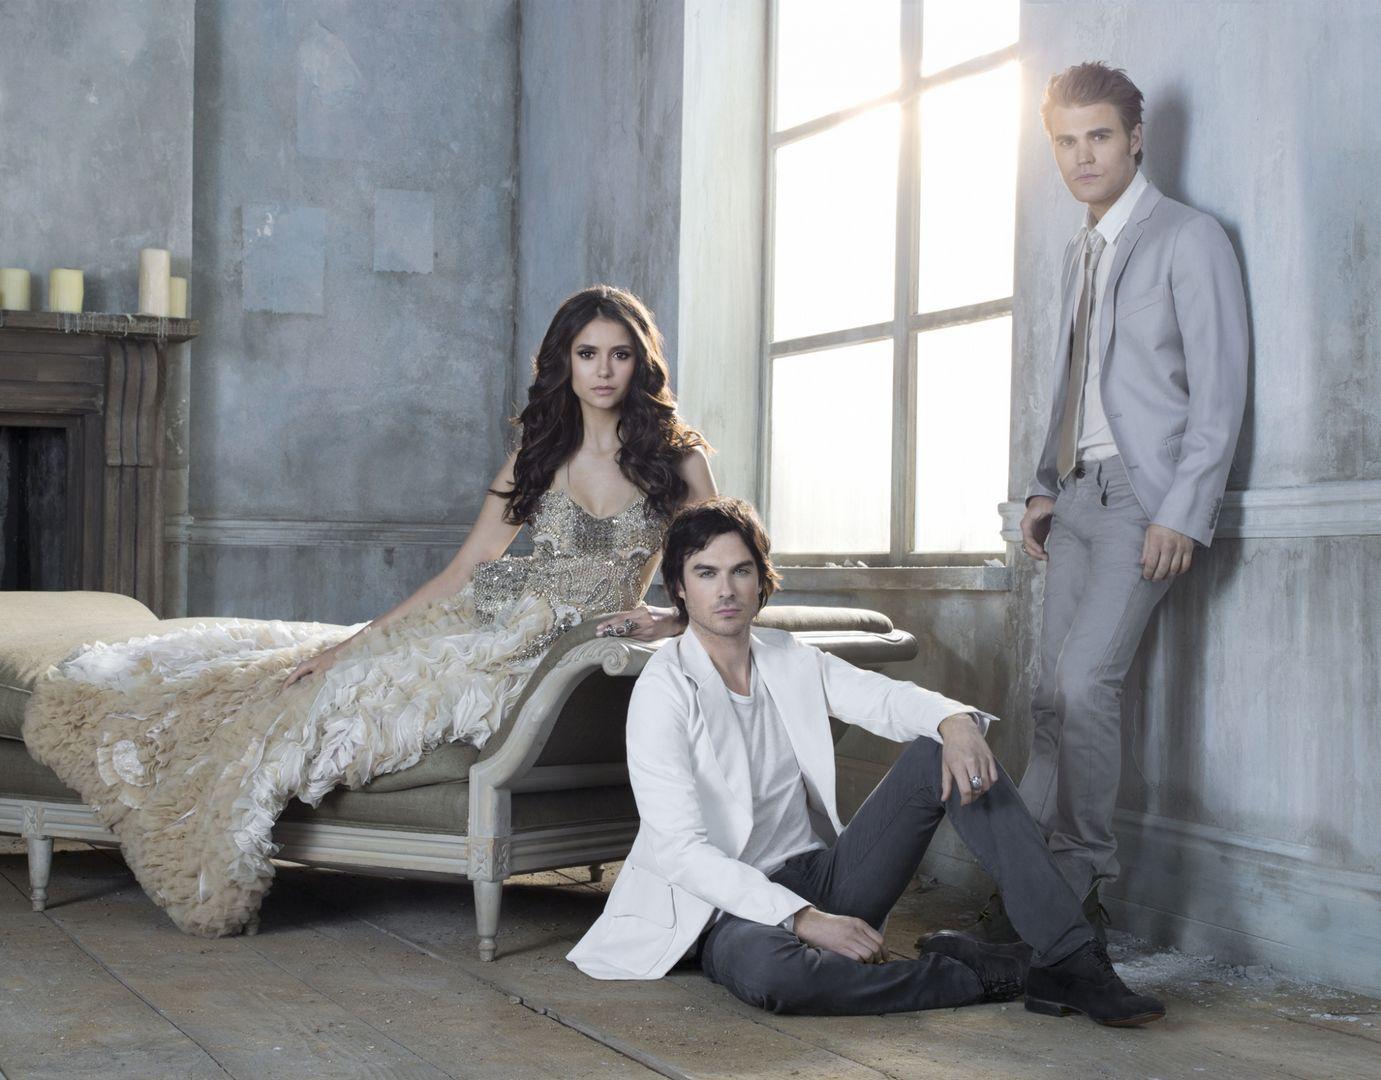 http://3.bp.blogspot.com/-OKW6AhhTNic/Tq27kg8duII/AAAAAAAAAIw/Yx6xu27HltQ/s1600/The-Vampire-Diaries-Season-3-Cast-Promotional-Photo-HQ-damon-and-elena-24830975-1381-1080.jpg